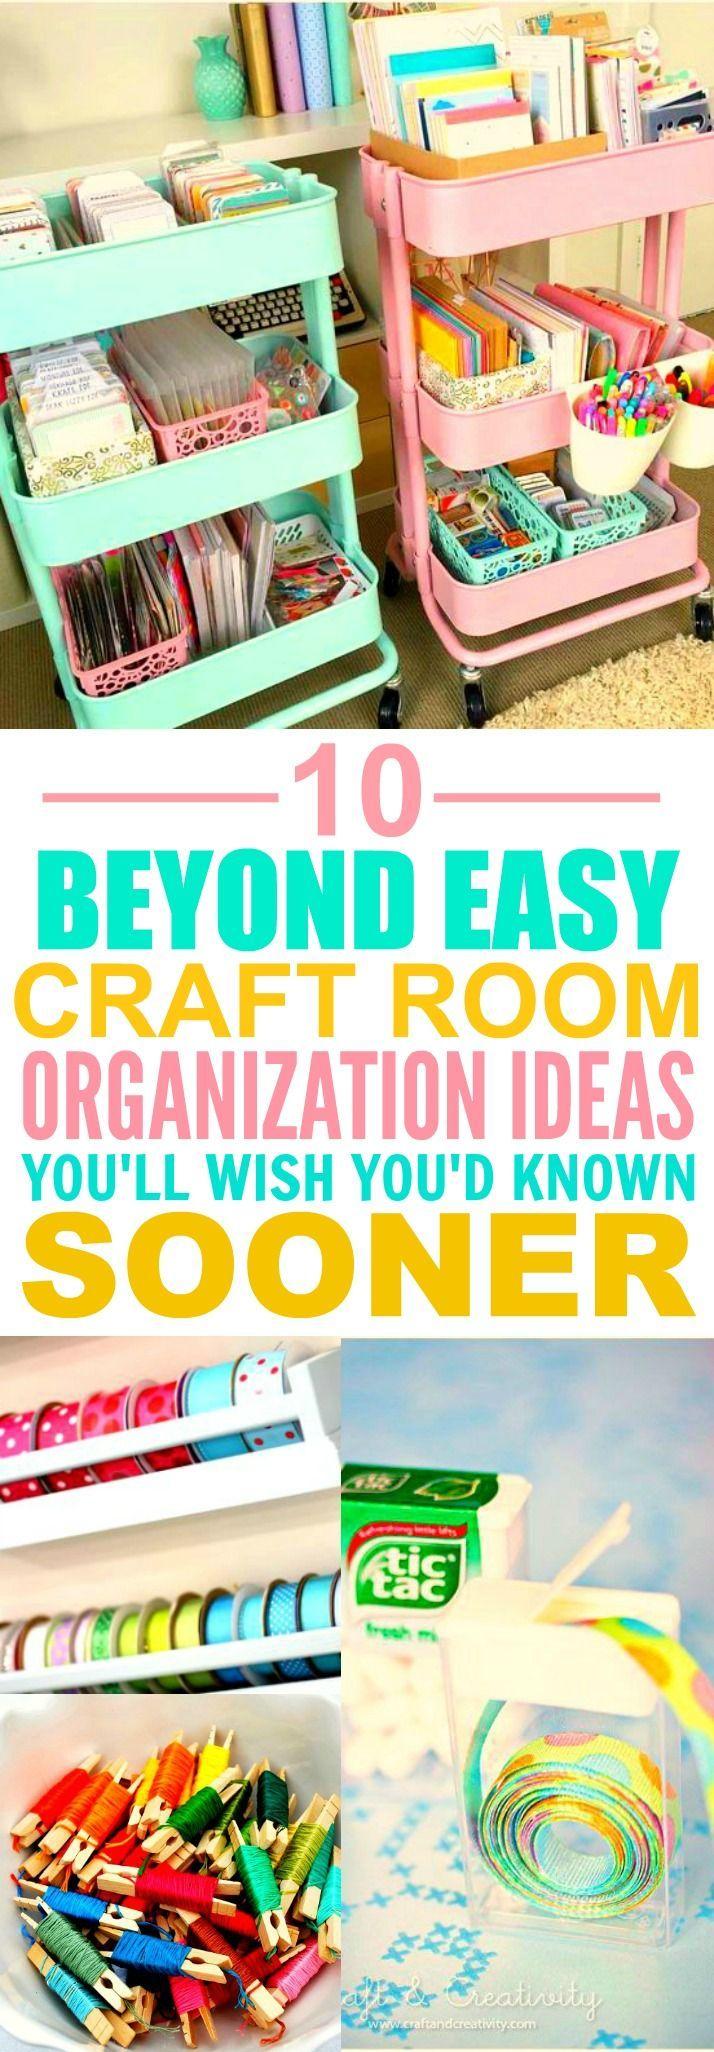 10 Beyond Clever Craft Room Organization Ideas Craft Room Organization Craft Room Storage Craft Organization